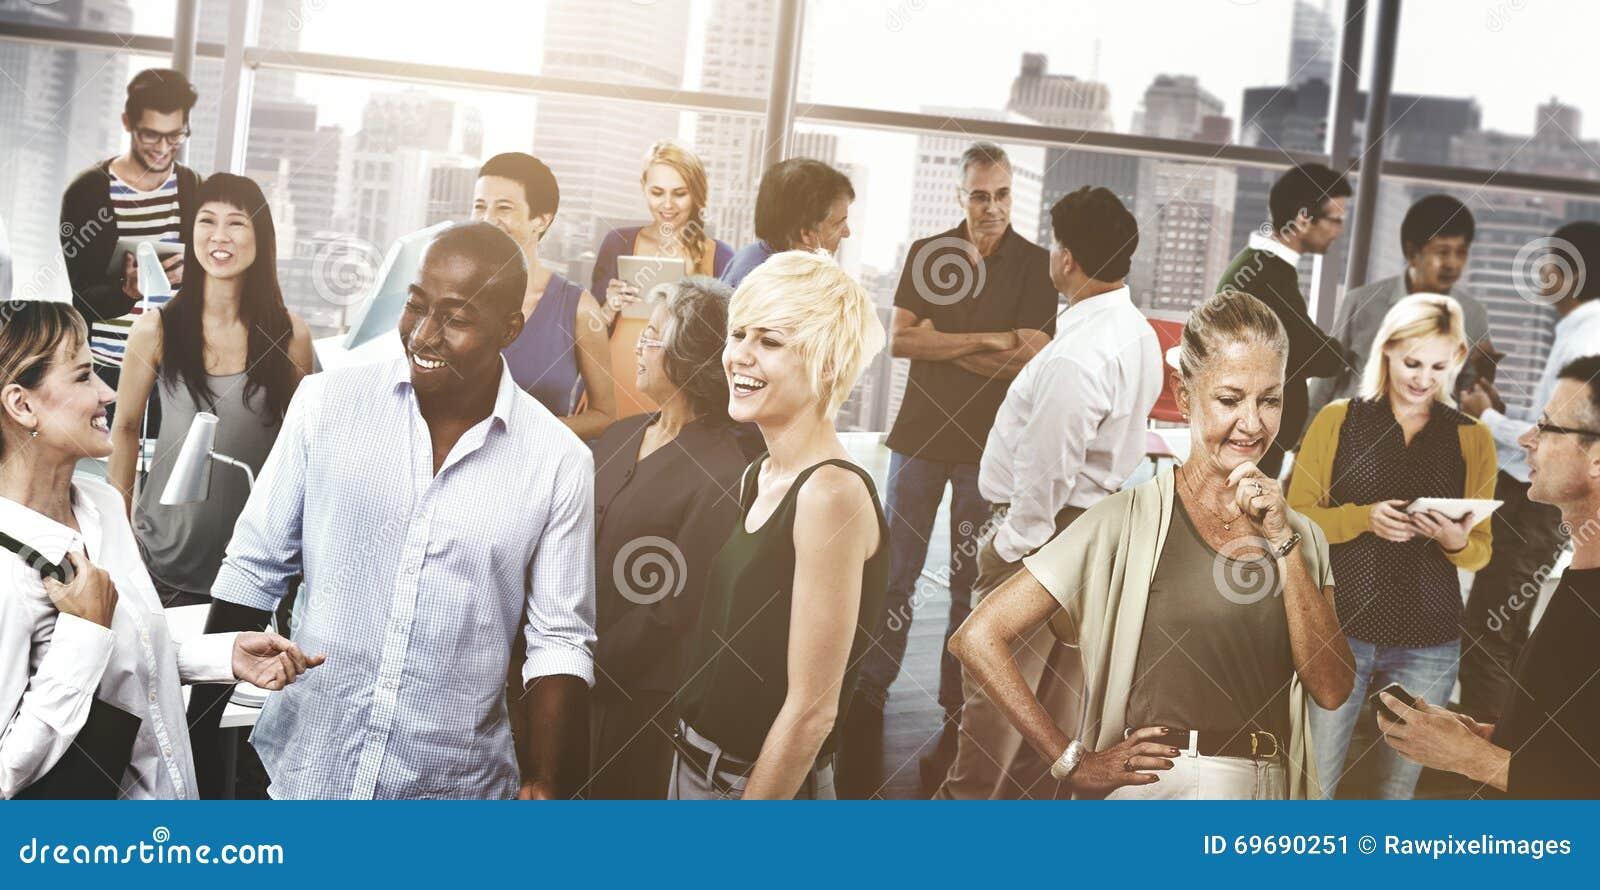 Community Business People Communication Connection Concept